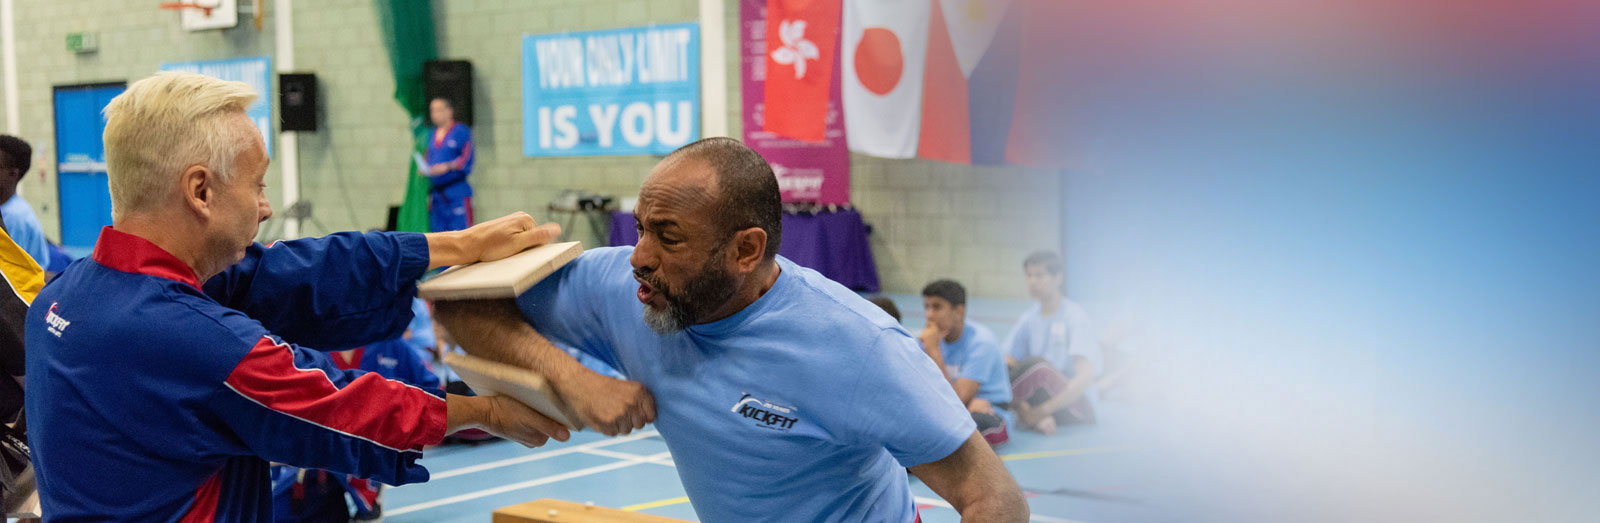 adults-martial-arts-classes-slough-london